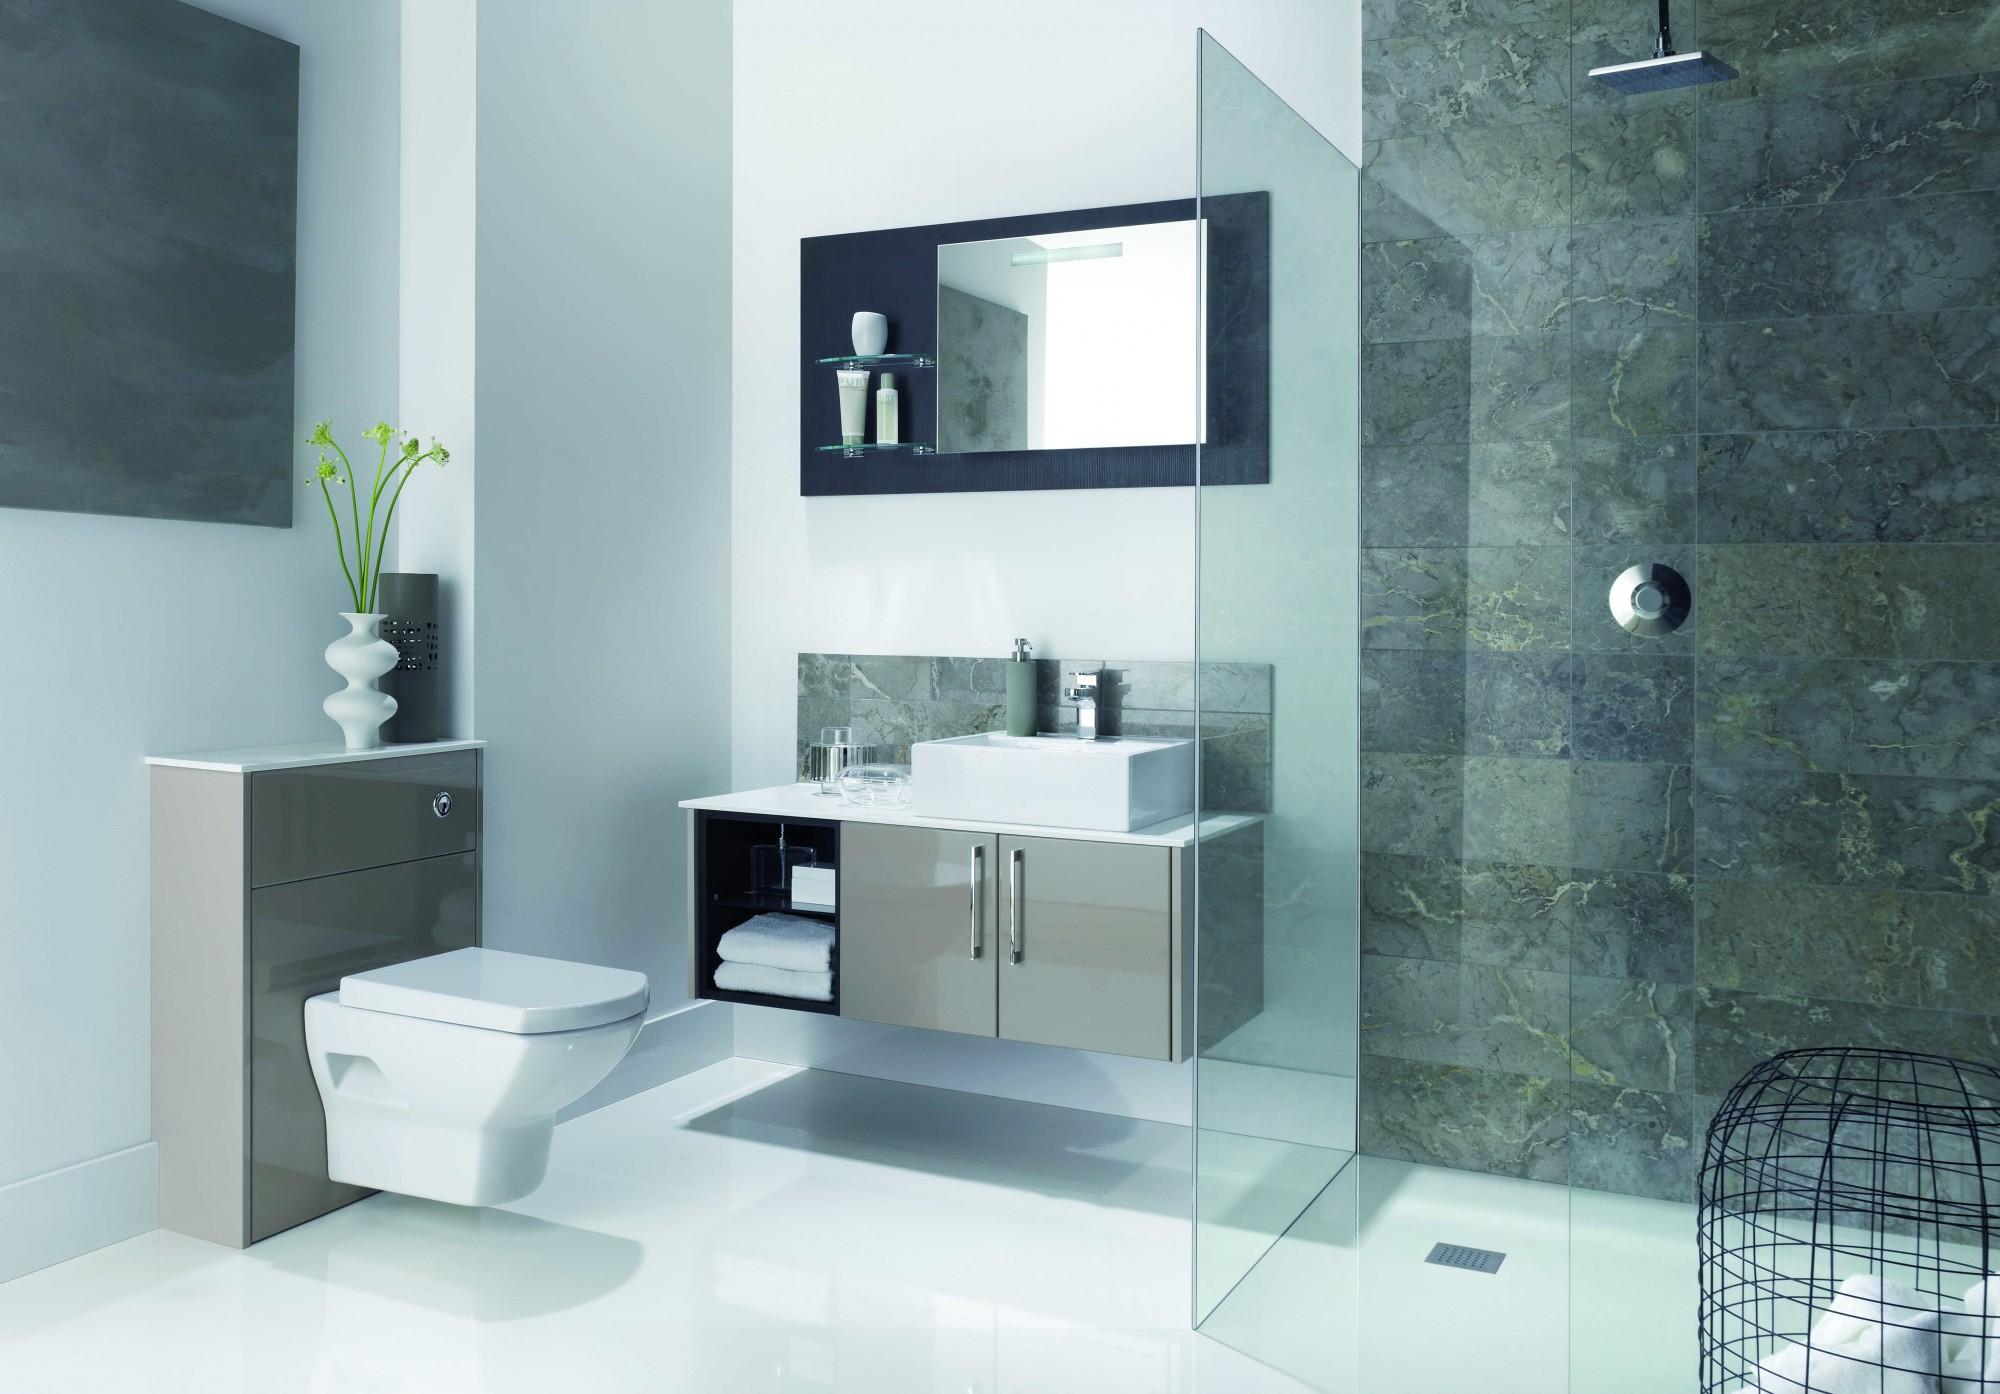 2018 Bathroom Tile Ideas & Trends | KBSA